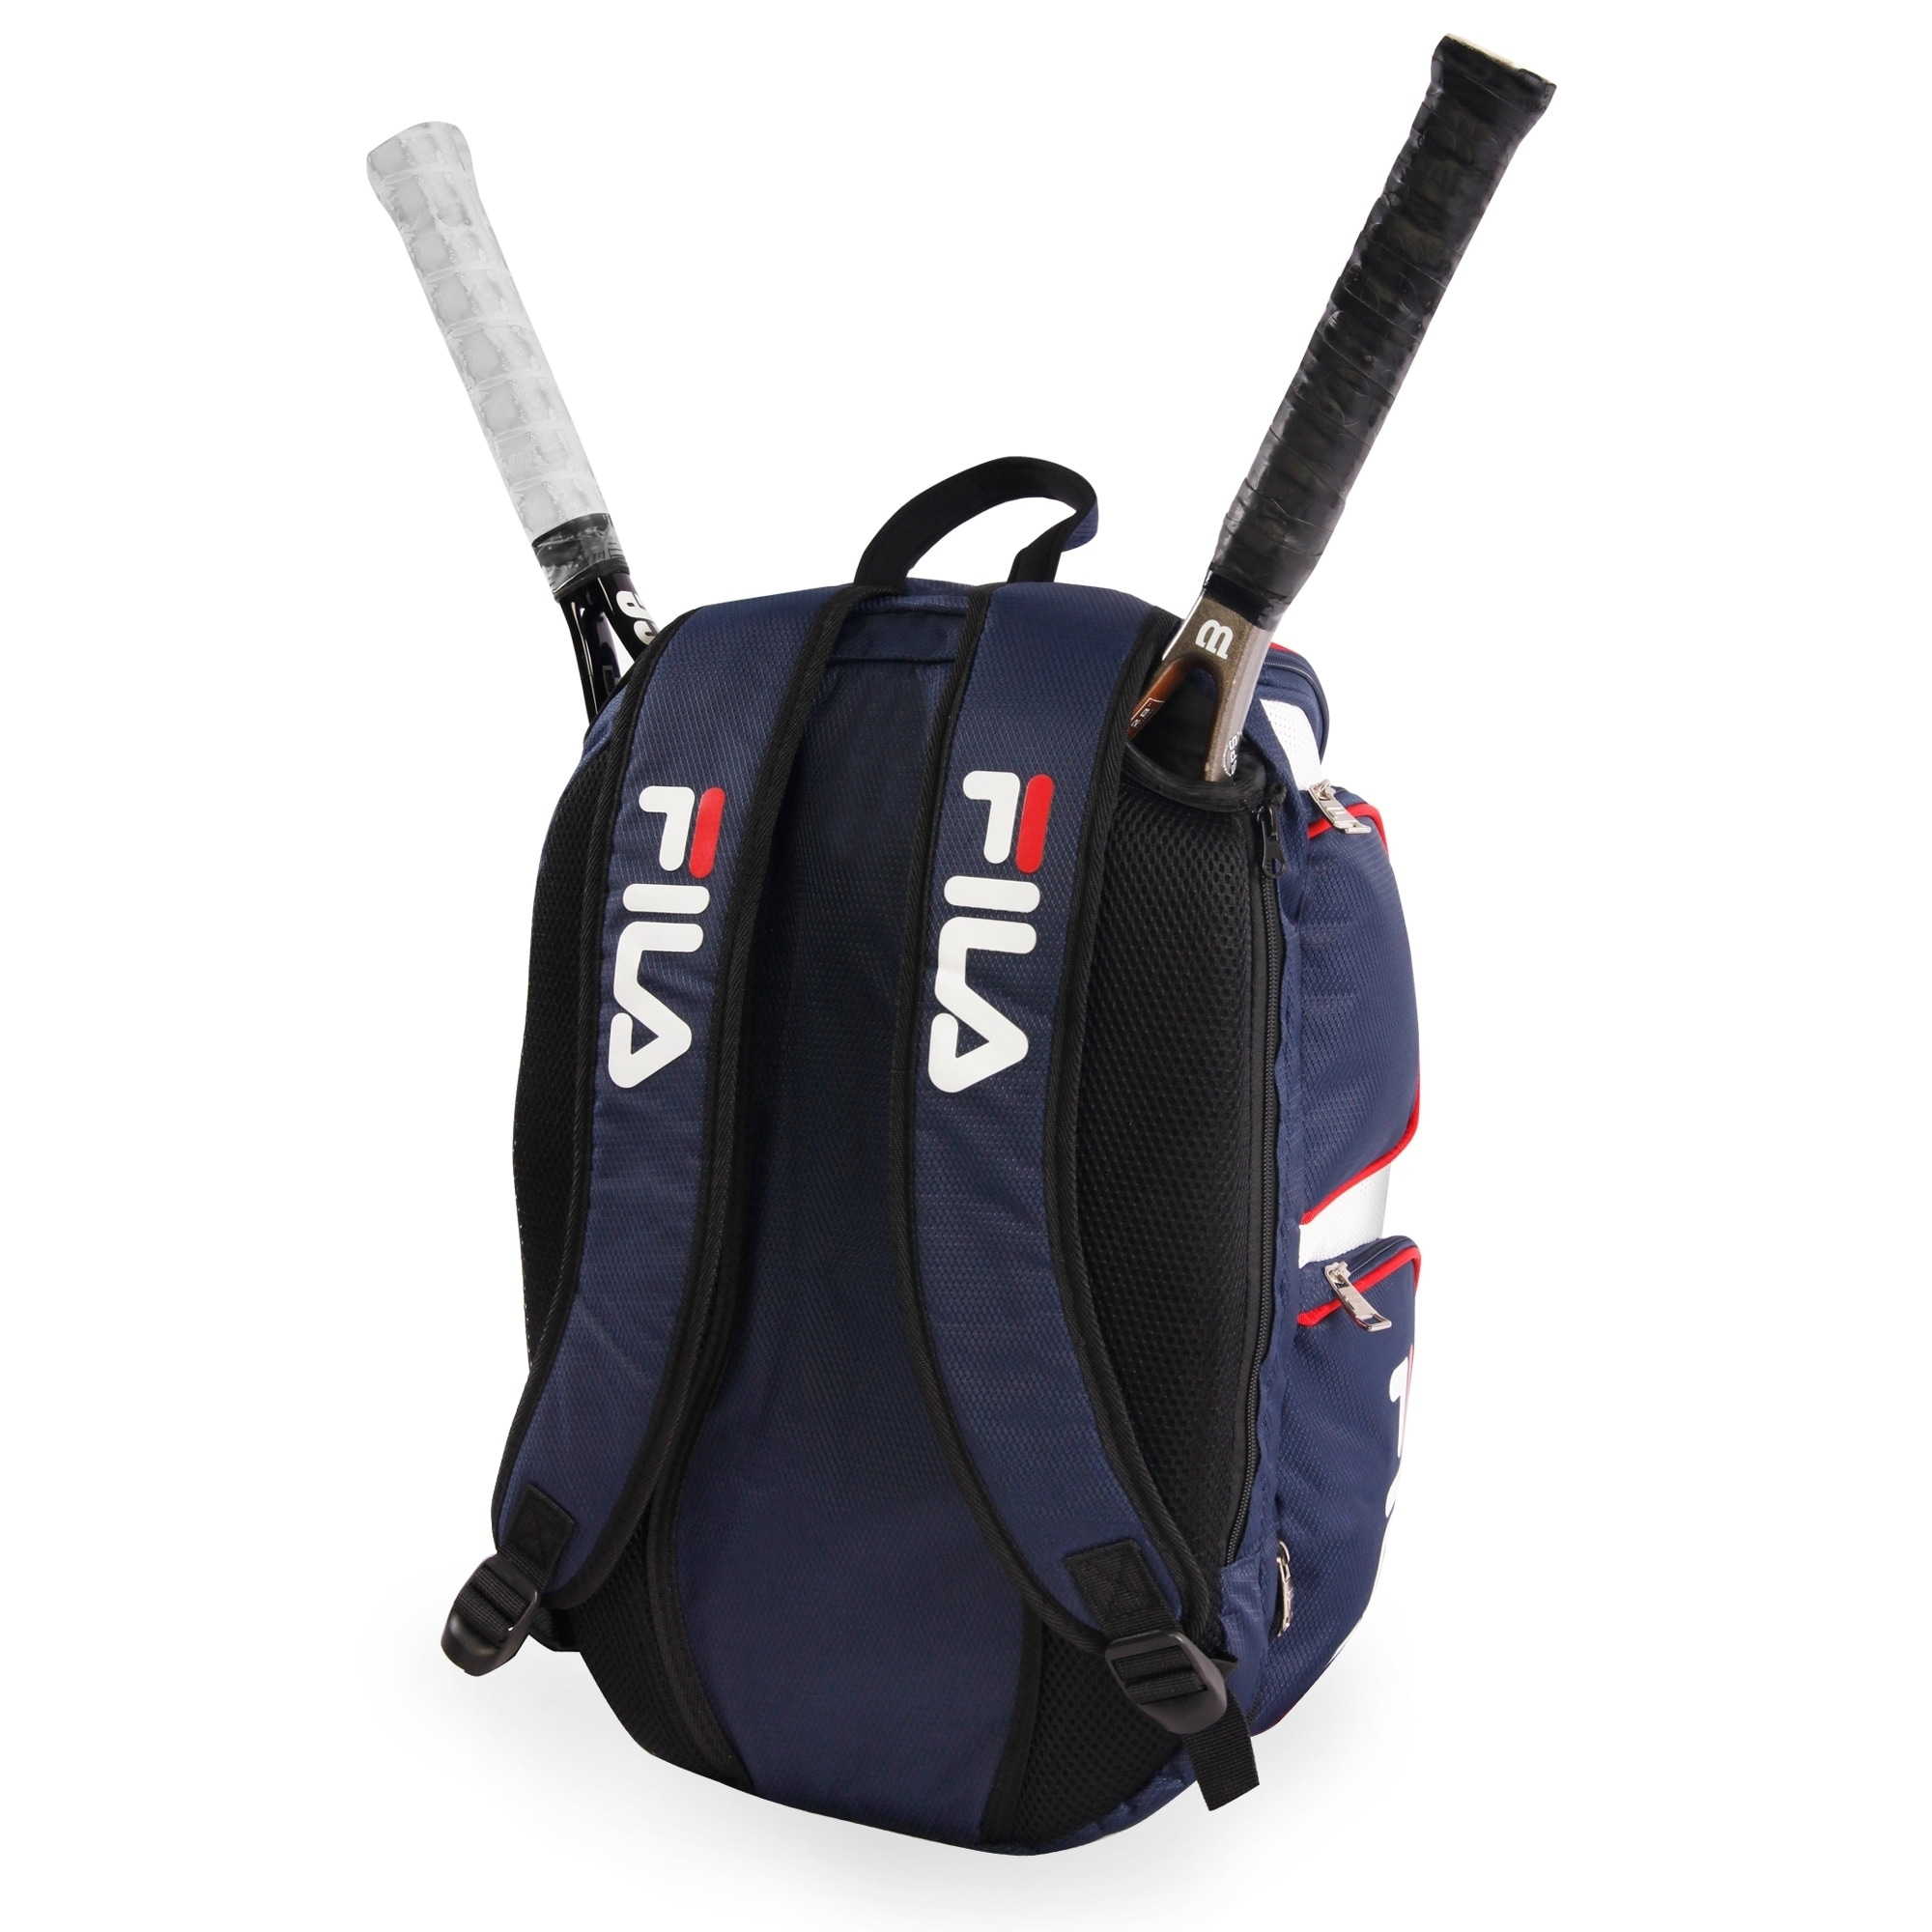 FILA Heritage Tennis Backpack Black One Size for sale online